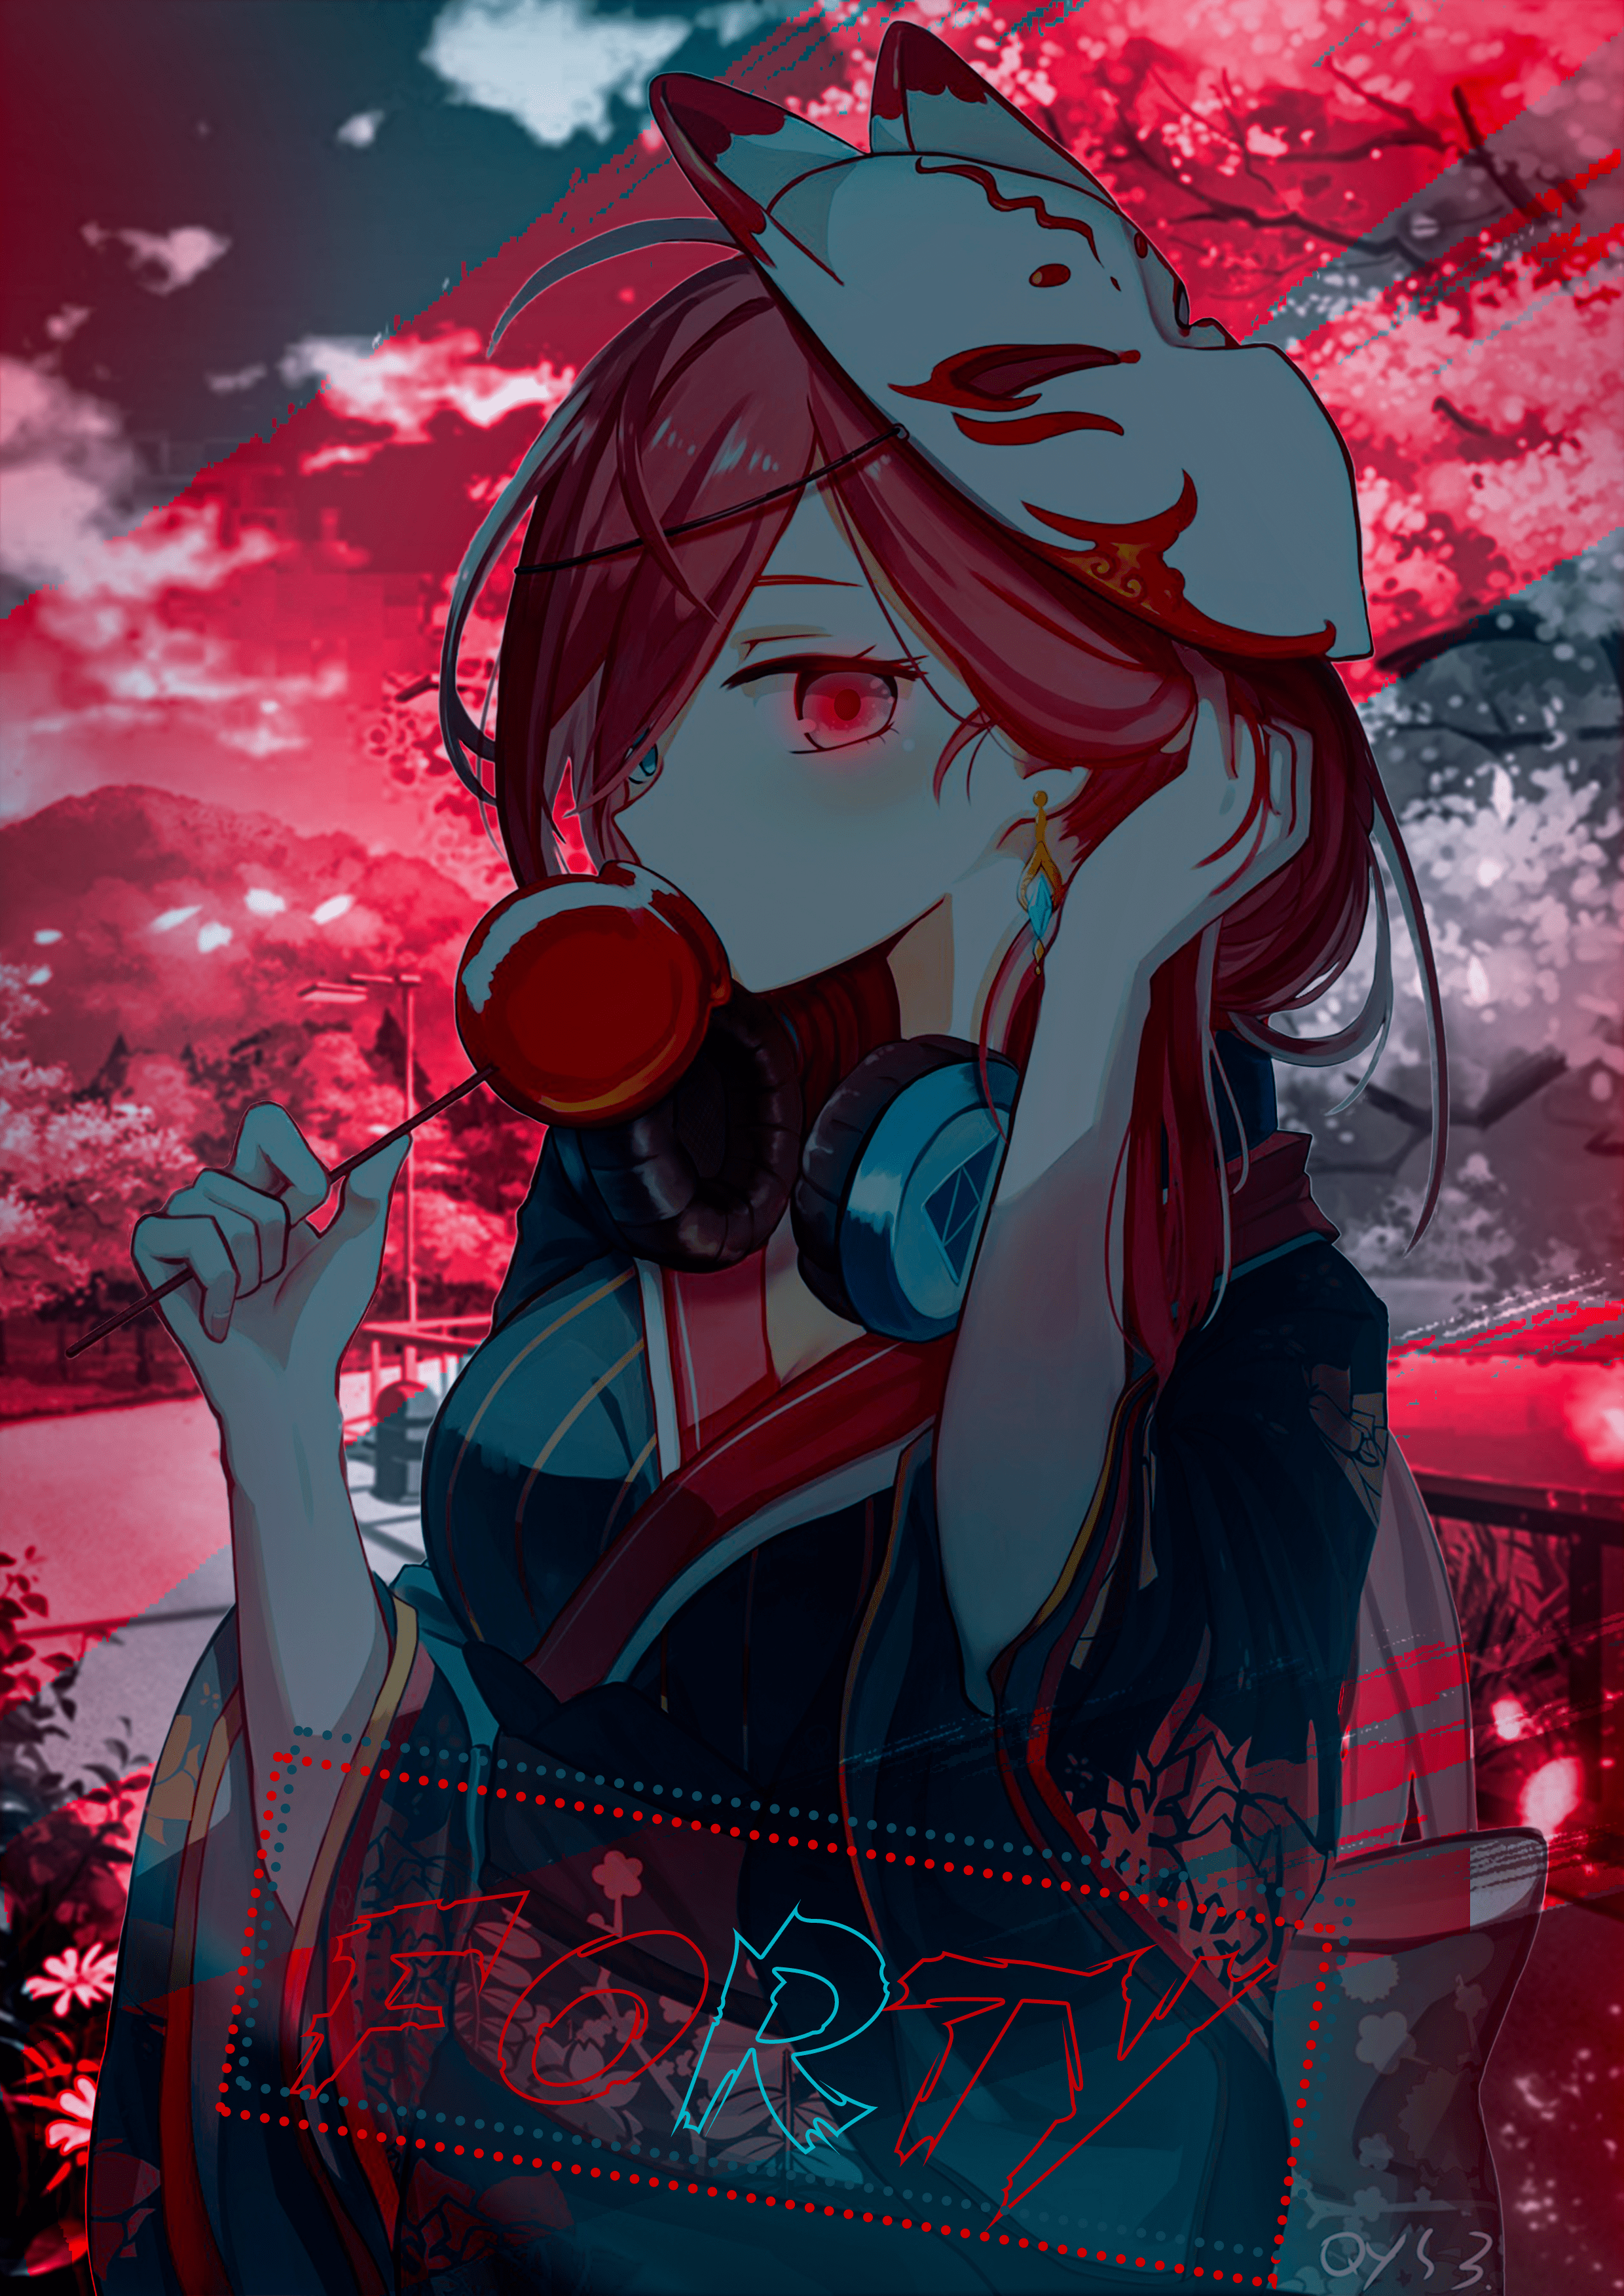 Anime 2480x3507 yukata anime glowing heterochromia redhead mask Japanese clothes anime girls